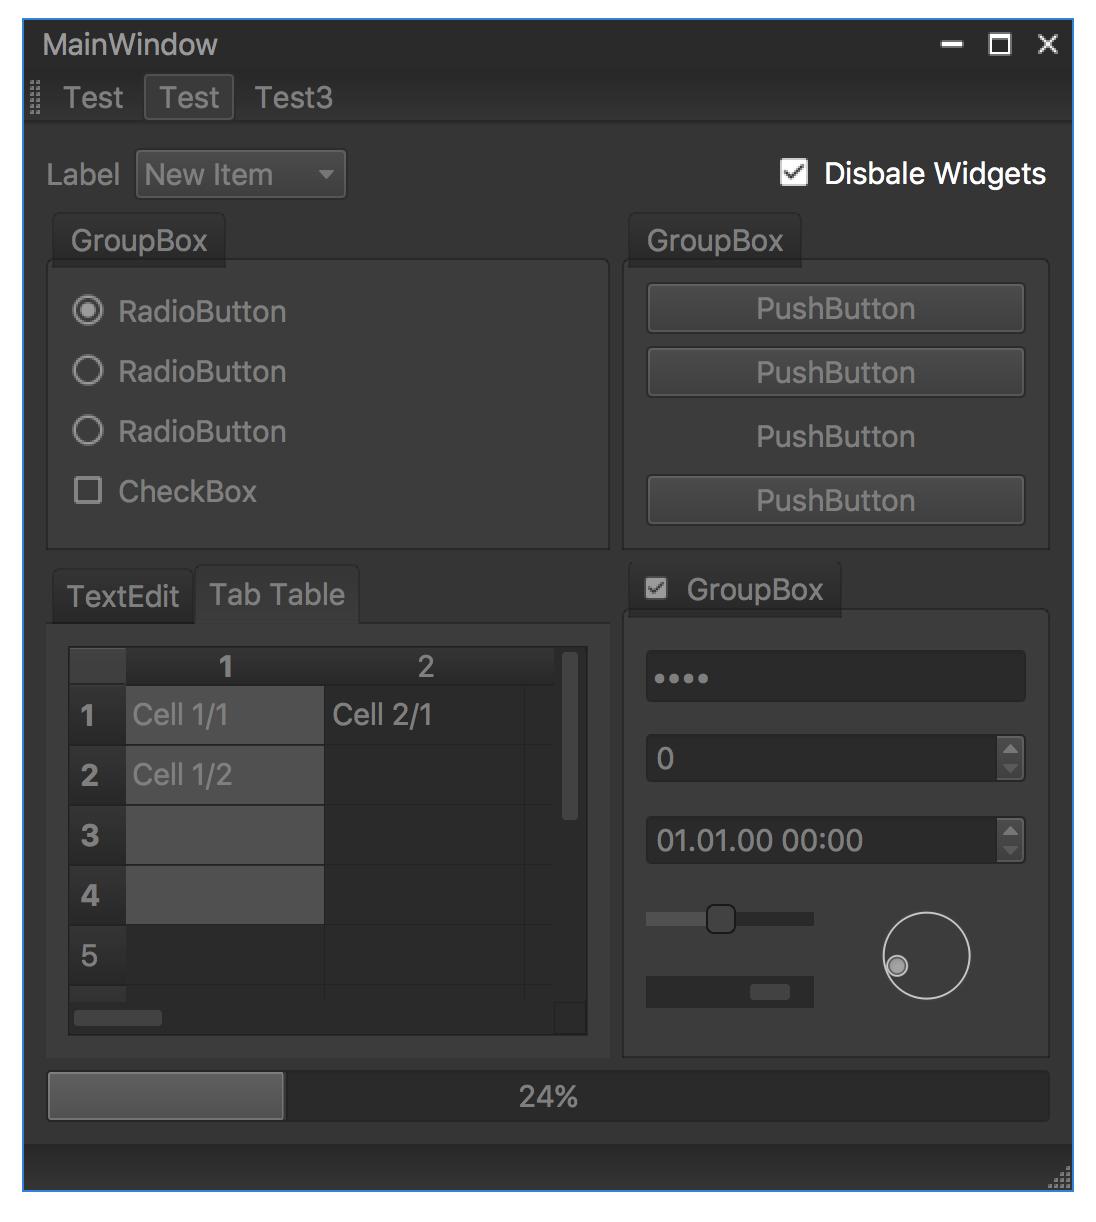 screenshot qt frameless window with custom dark style - mac disabled